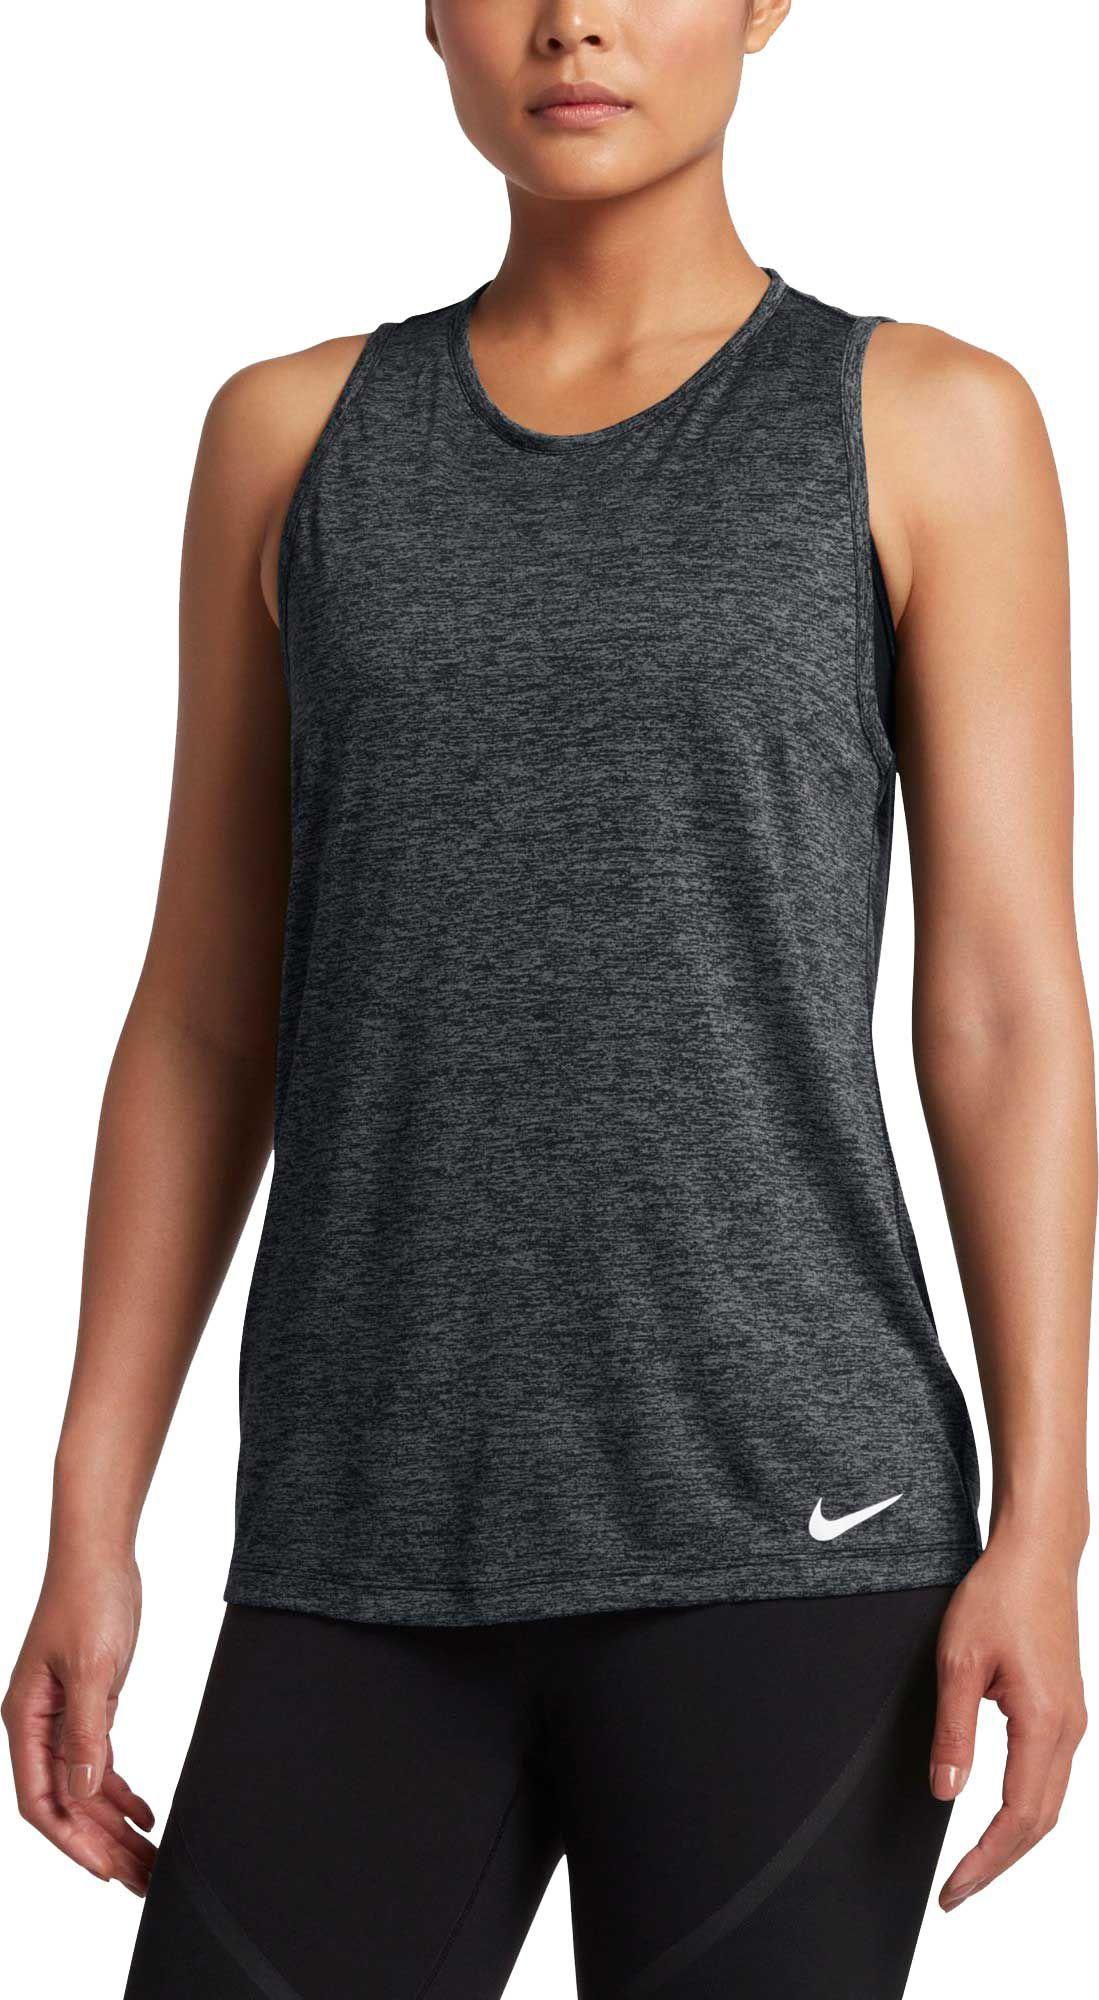 5891a0bda Nike Women's Dry Tomboy Cross-Dye Tank Top | Products | Nike women ...